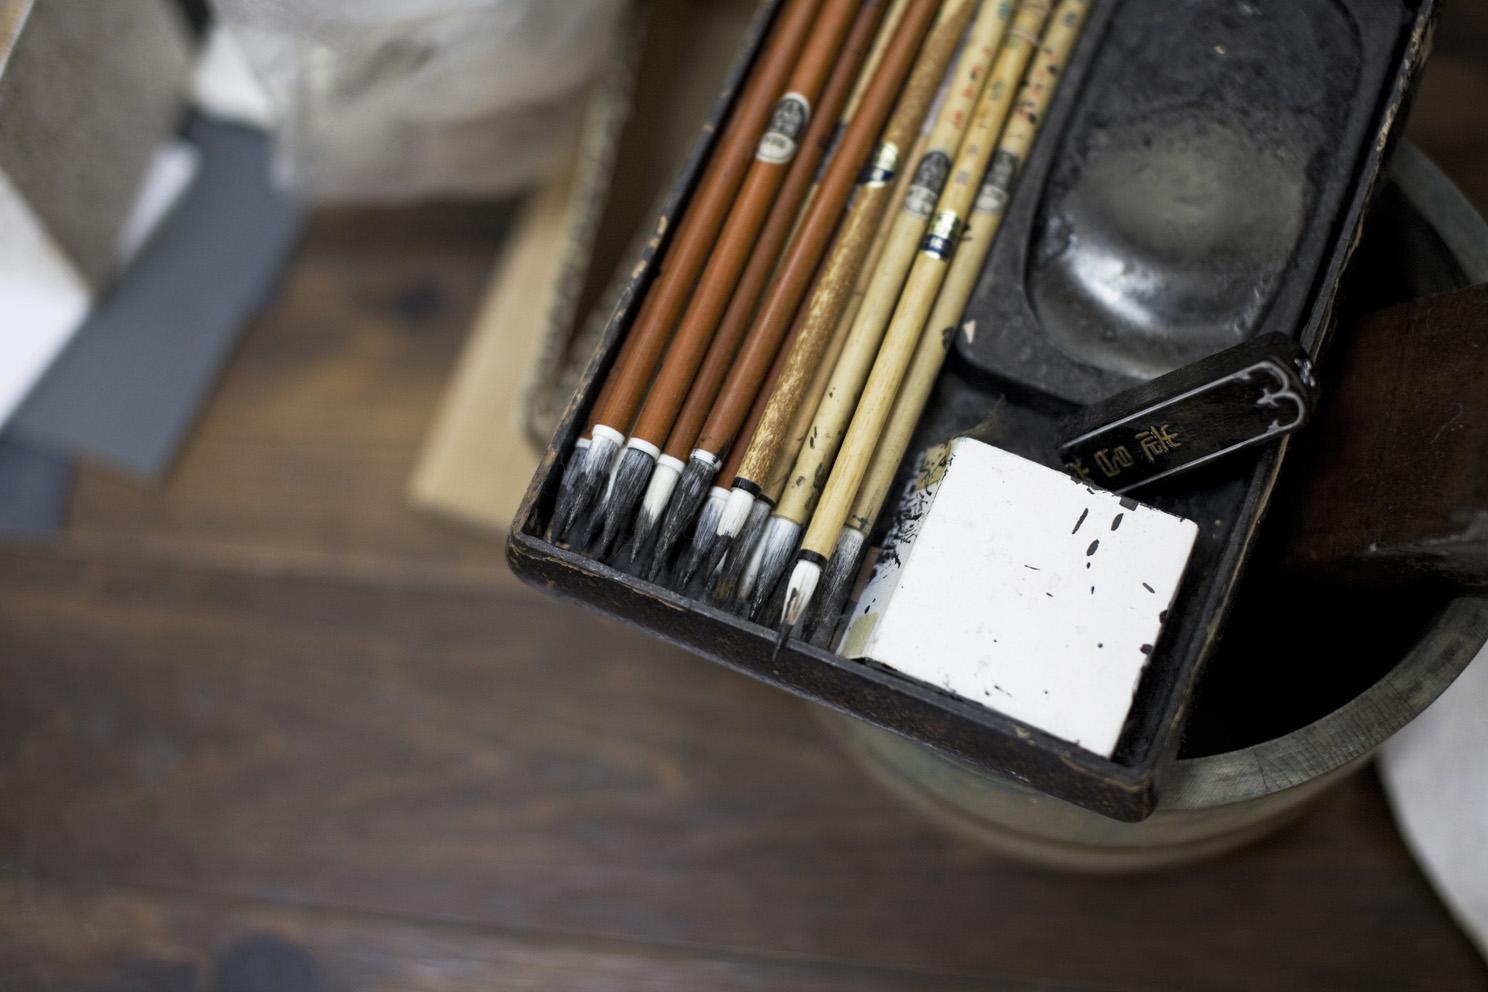 Tools belonging to Mr Ikeda